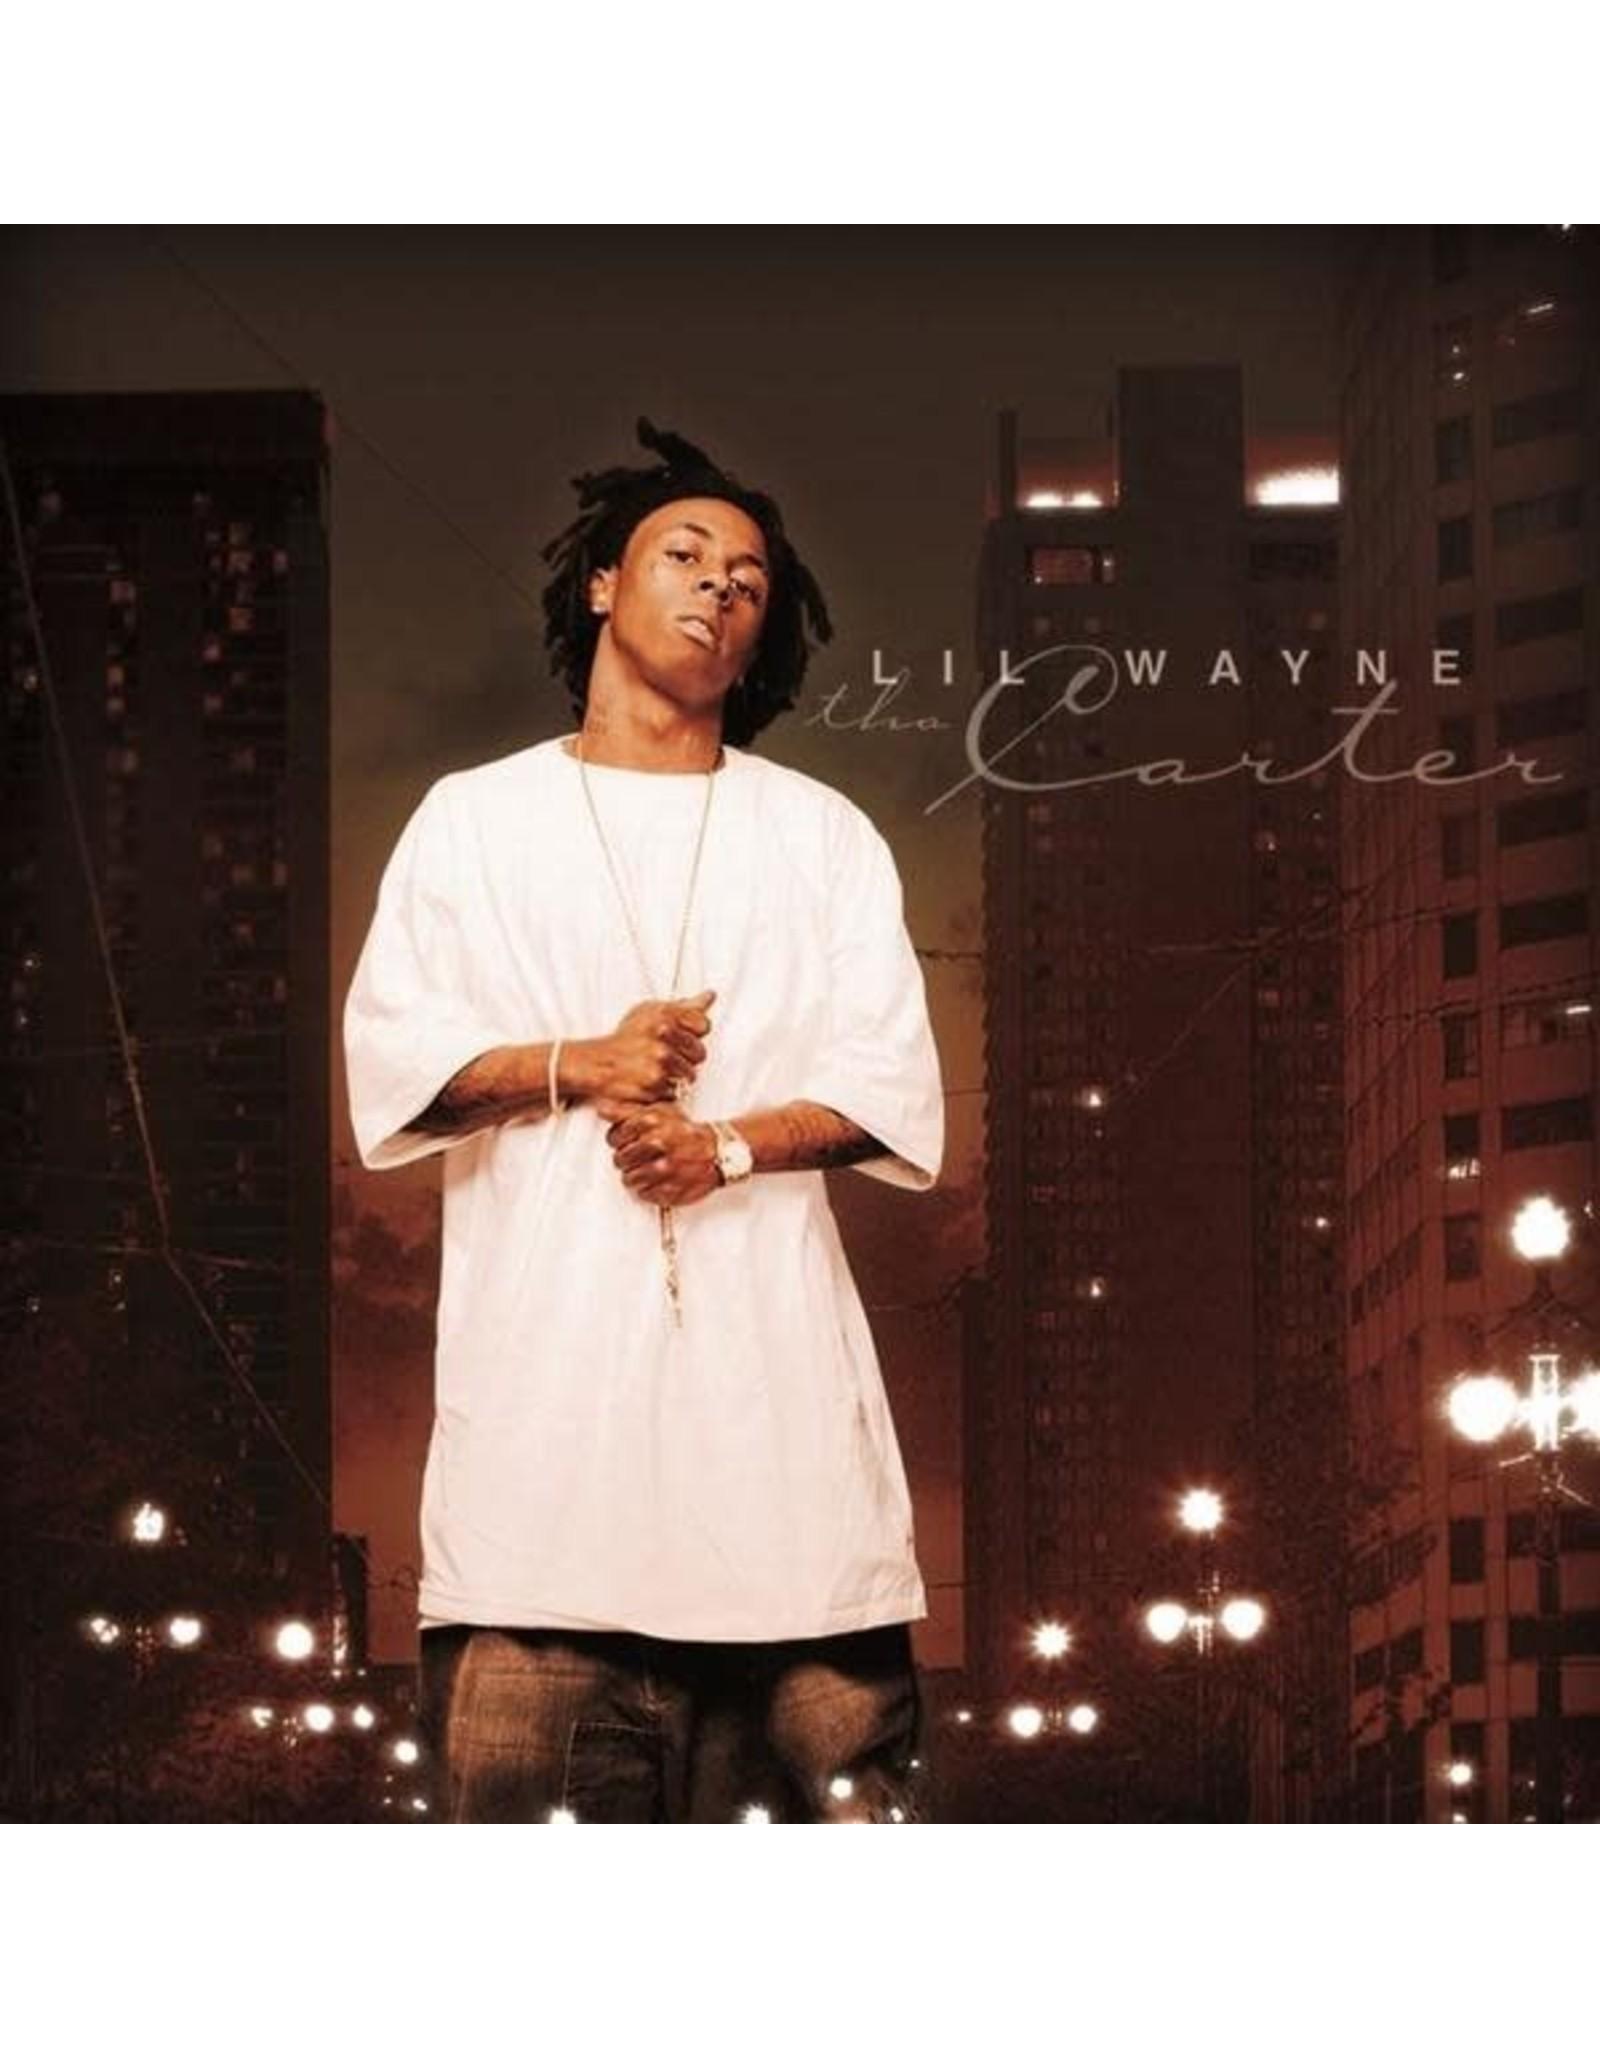 Lil Wayne - Tha Carter 2LP